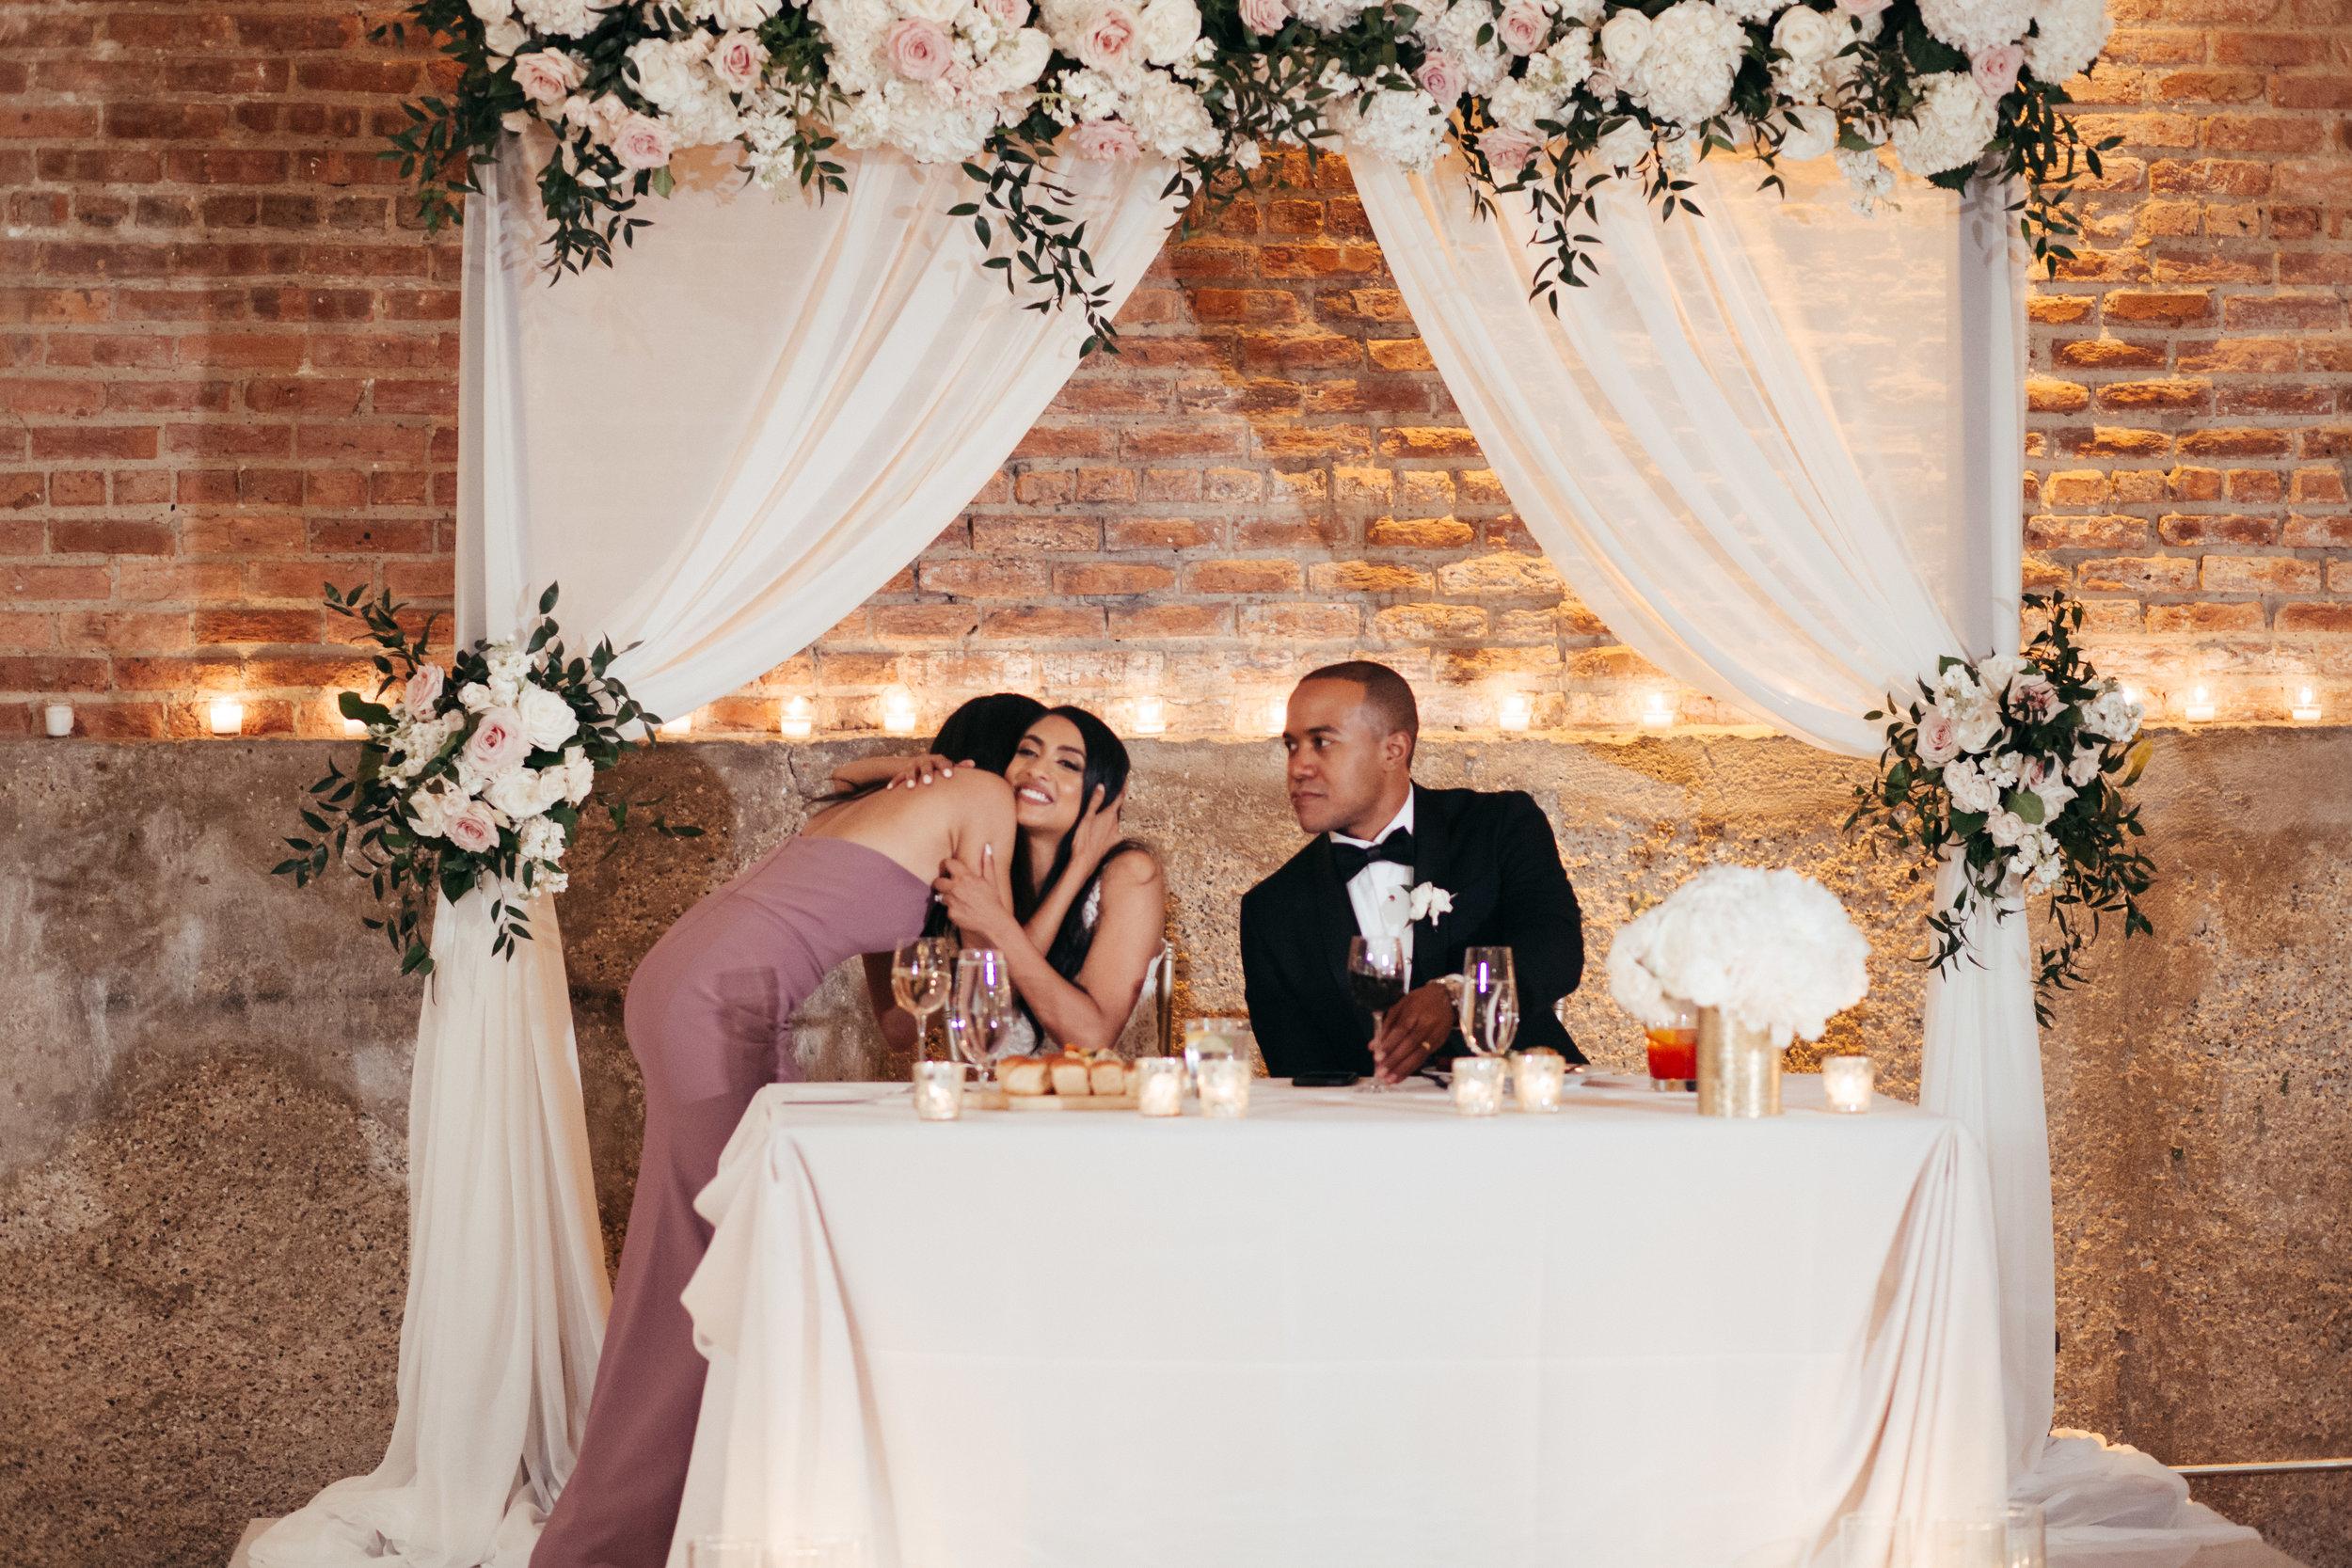 Mindy&Jared-wedding-by-LadiesAndGentlemen-by-Matija-Vuri-5322.jpg